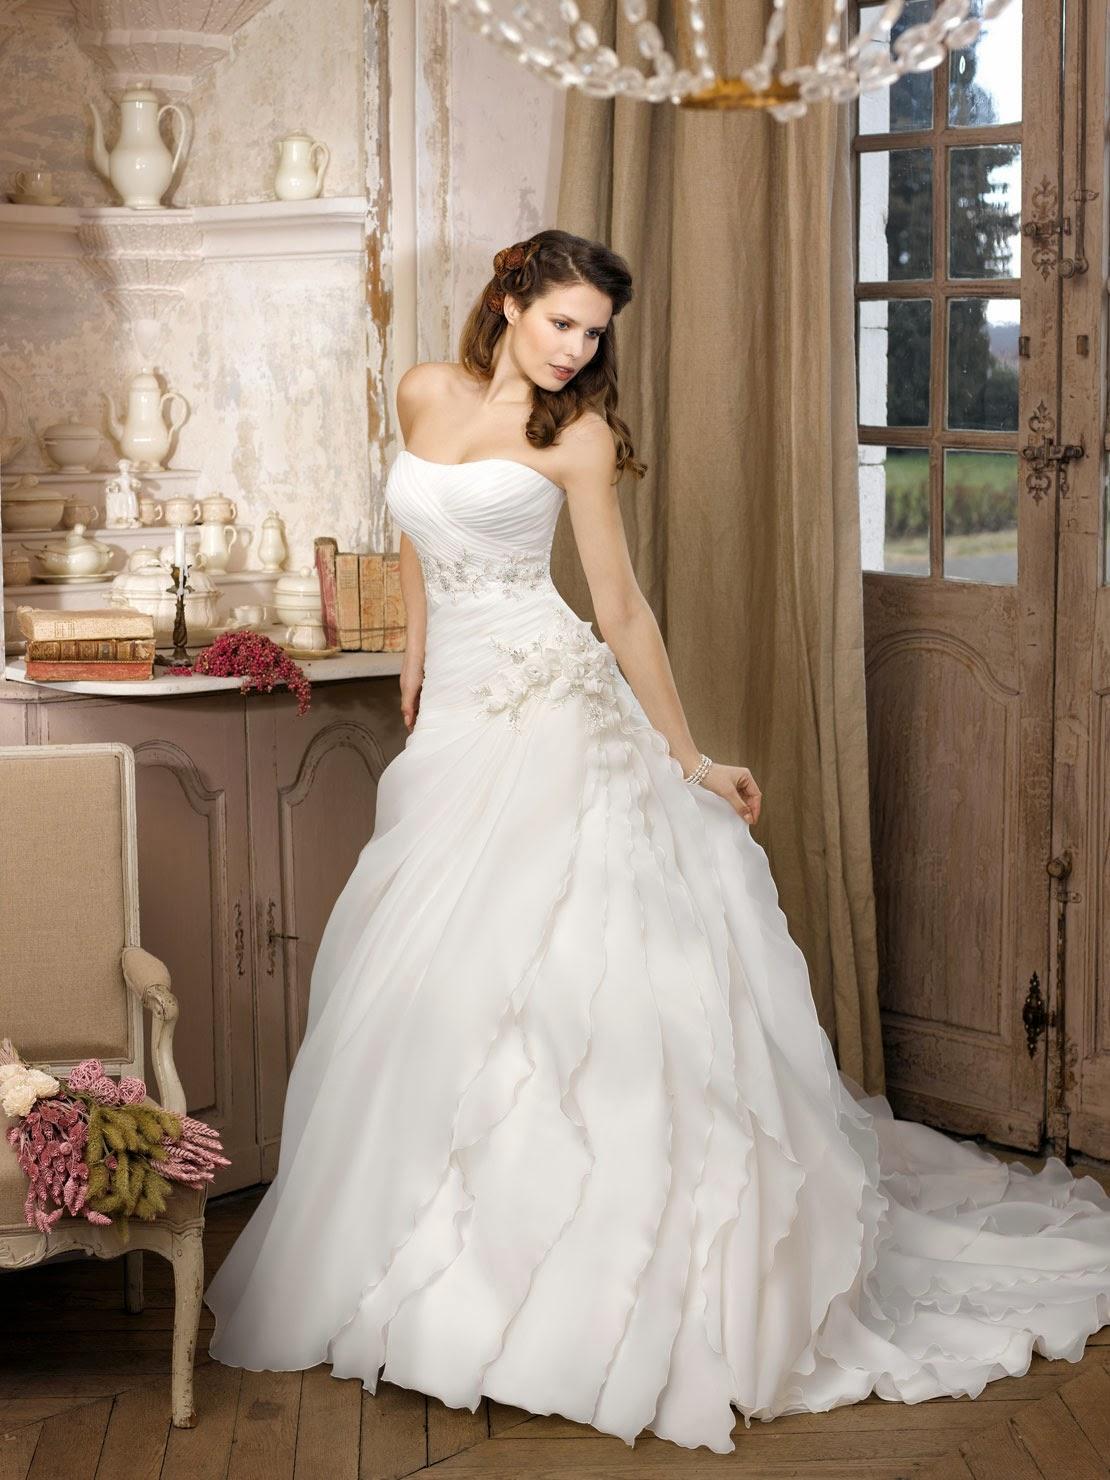 Indian Business   Top Business   USA Business: Online Wedding ...